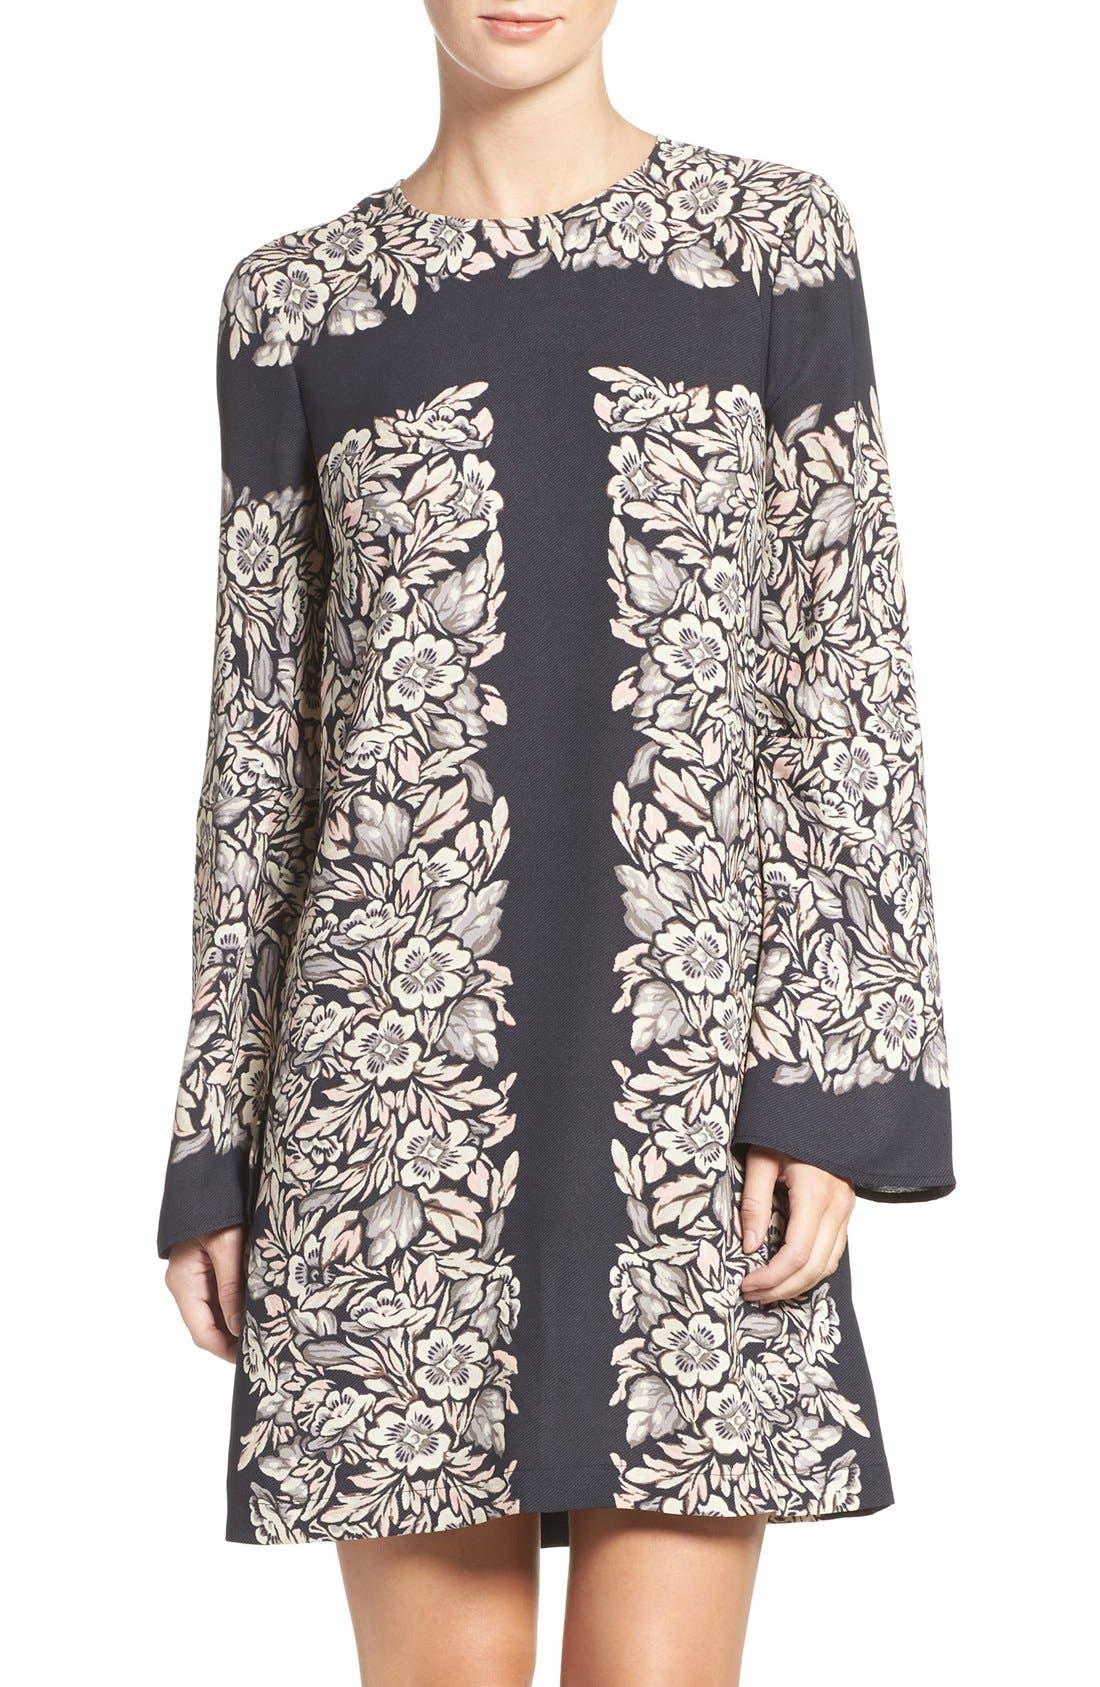 Alternate Image 1 Selected - BCBGMAXAZRIA 'Dulchey' Floral Crepe Trapeze Dress